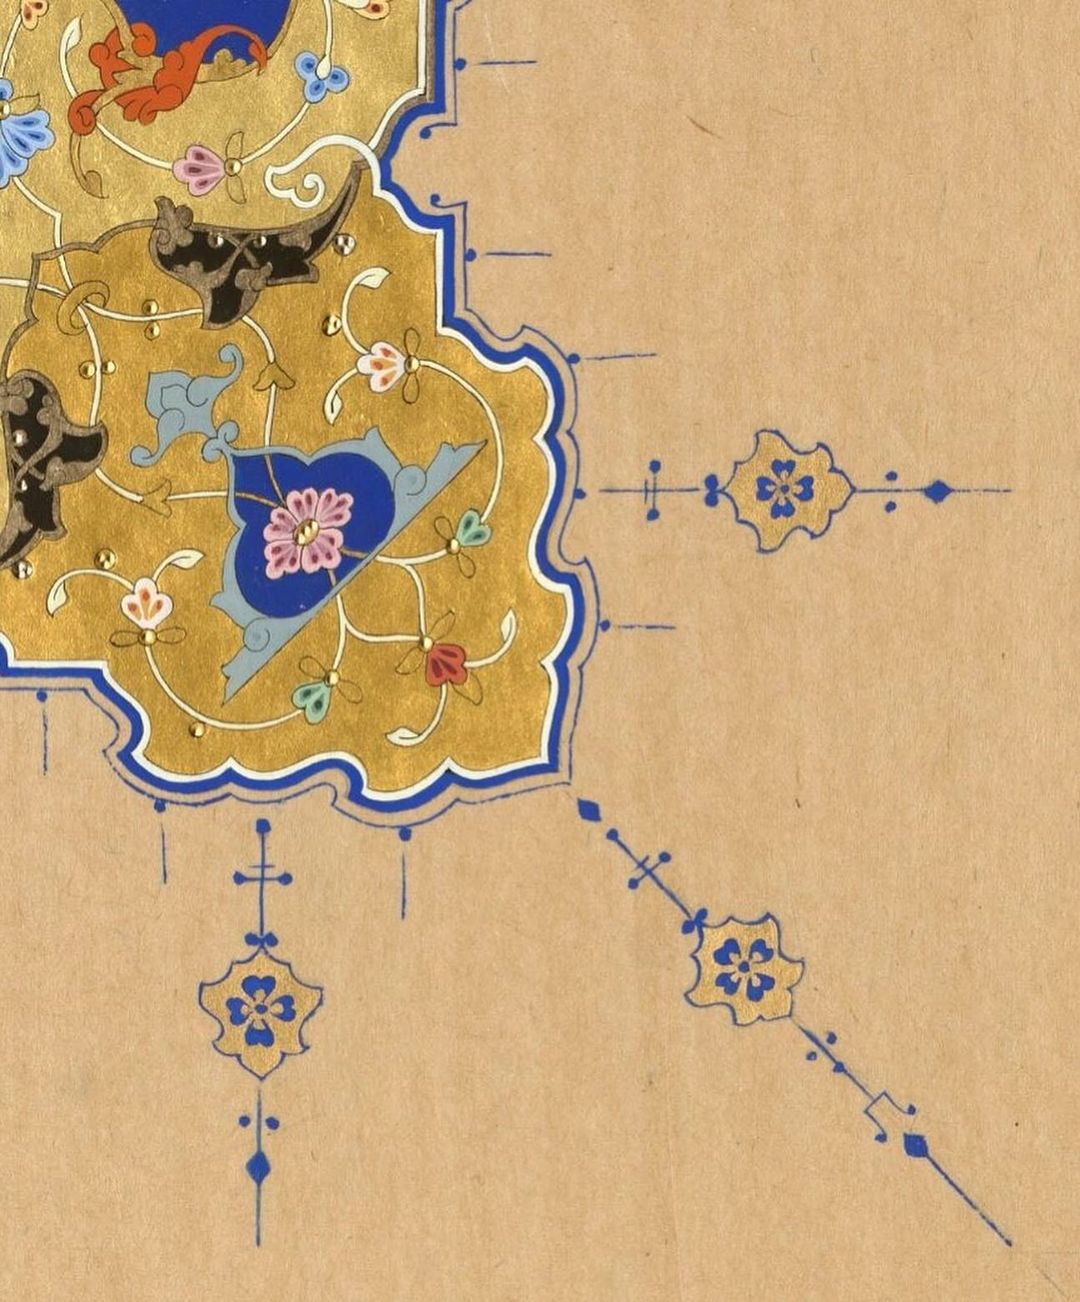 Apk Website For Arabic Calligraphy بِسْمِ اللّٰهِ الرَّحْمٰنِ الرَّح۪يمِ اَلْحَمْدُ لِلّٰهِ رَبِّ الْـعَالَم۪ينَۙ ا... 1441 5